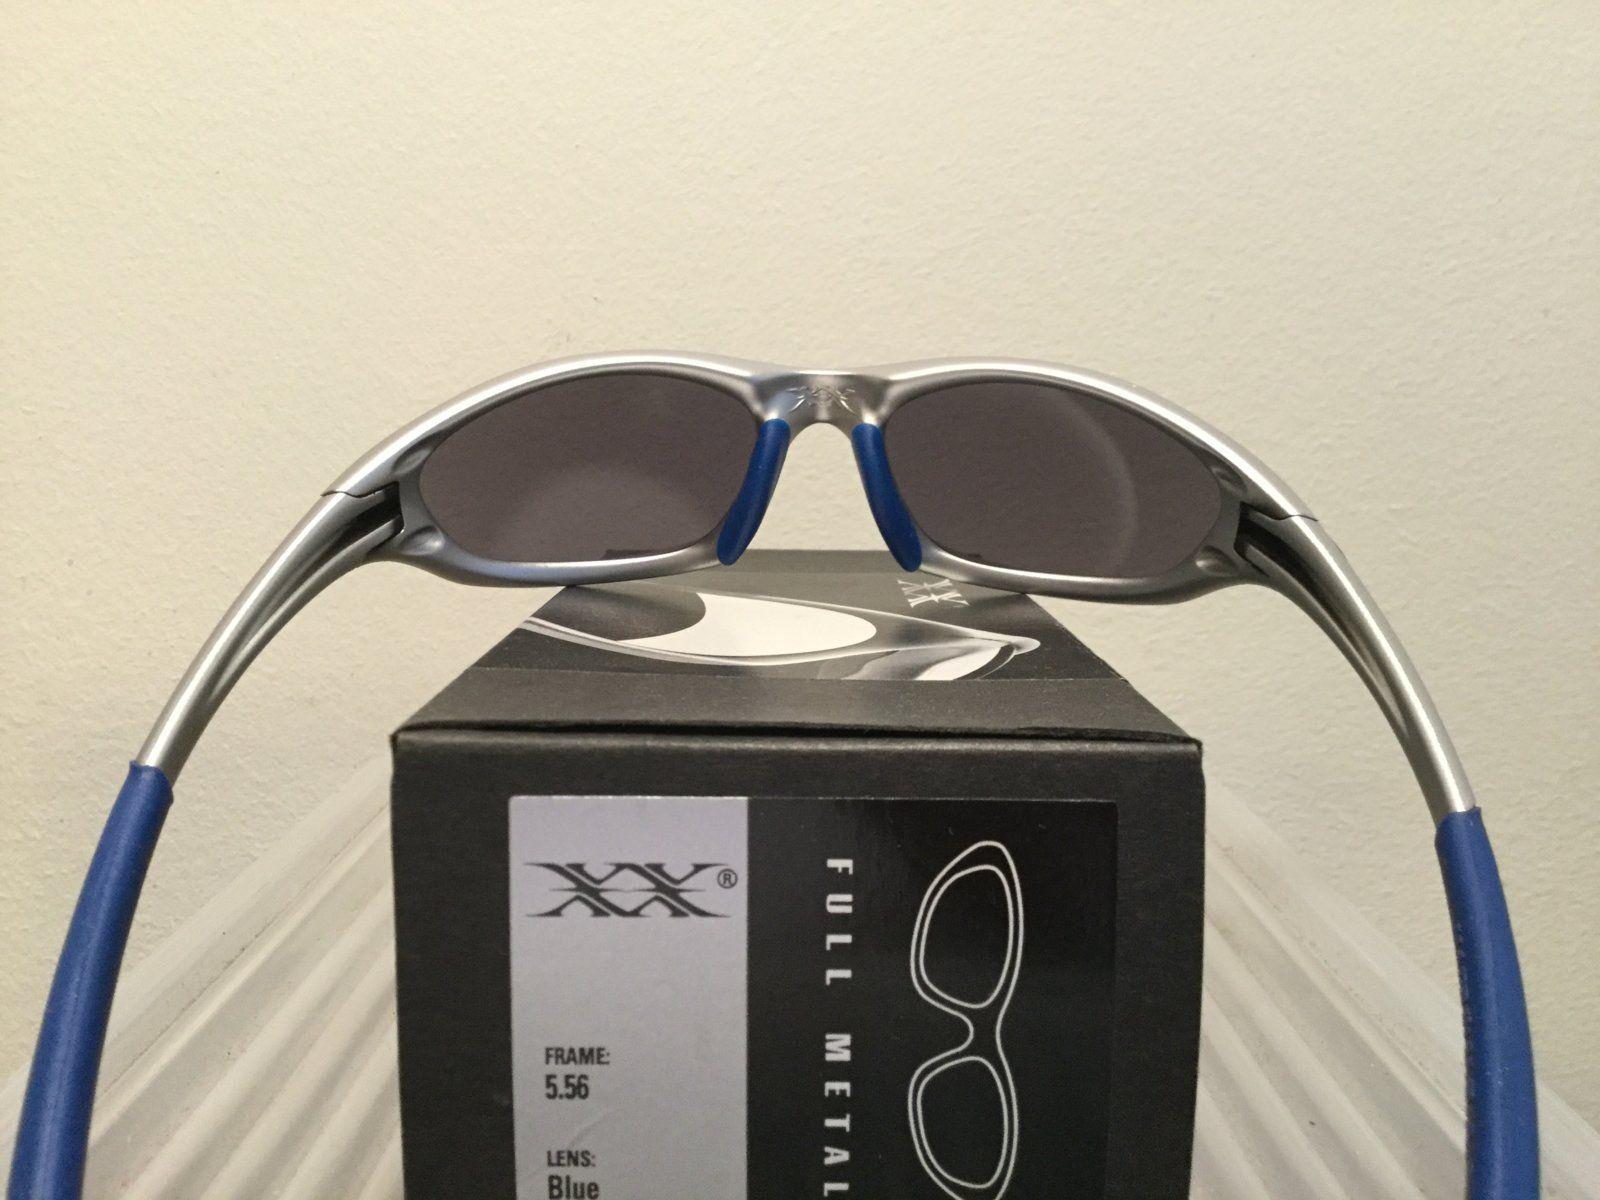 XX FMJ 5.56/Blue (ICE) - LNIB.. - IMG_0056.JPG